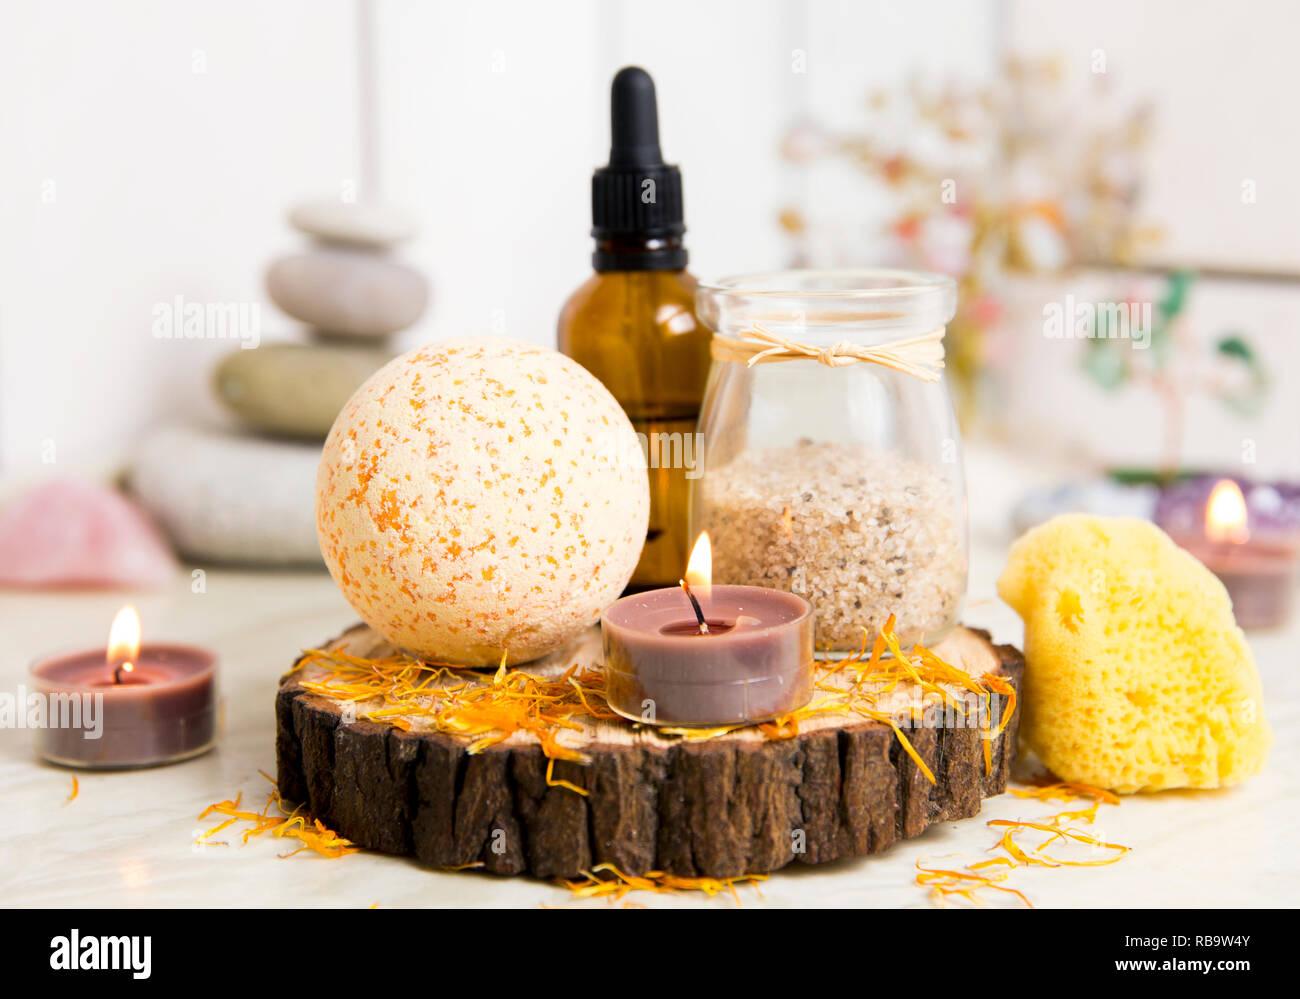 Side view of home wellness spa products, orange bath bomb, aroma bath salt, sea sponge, tea candles lit. Very zen set, tree of love, amethyst crystal. - Stock Image